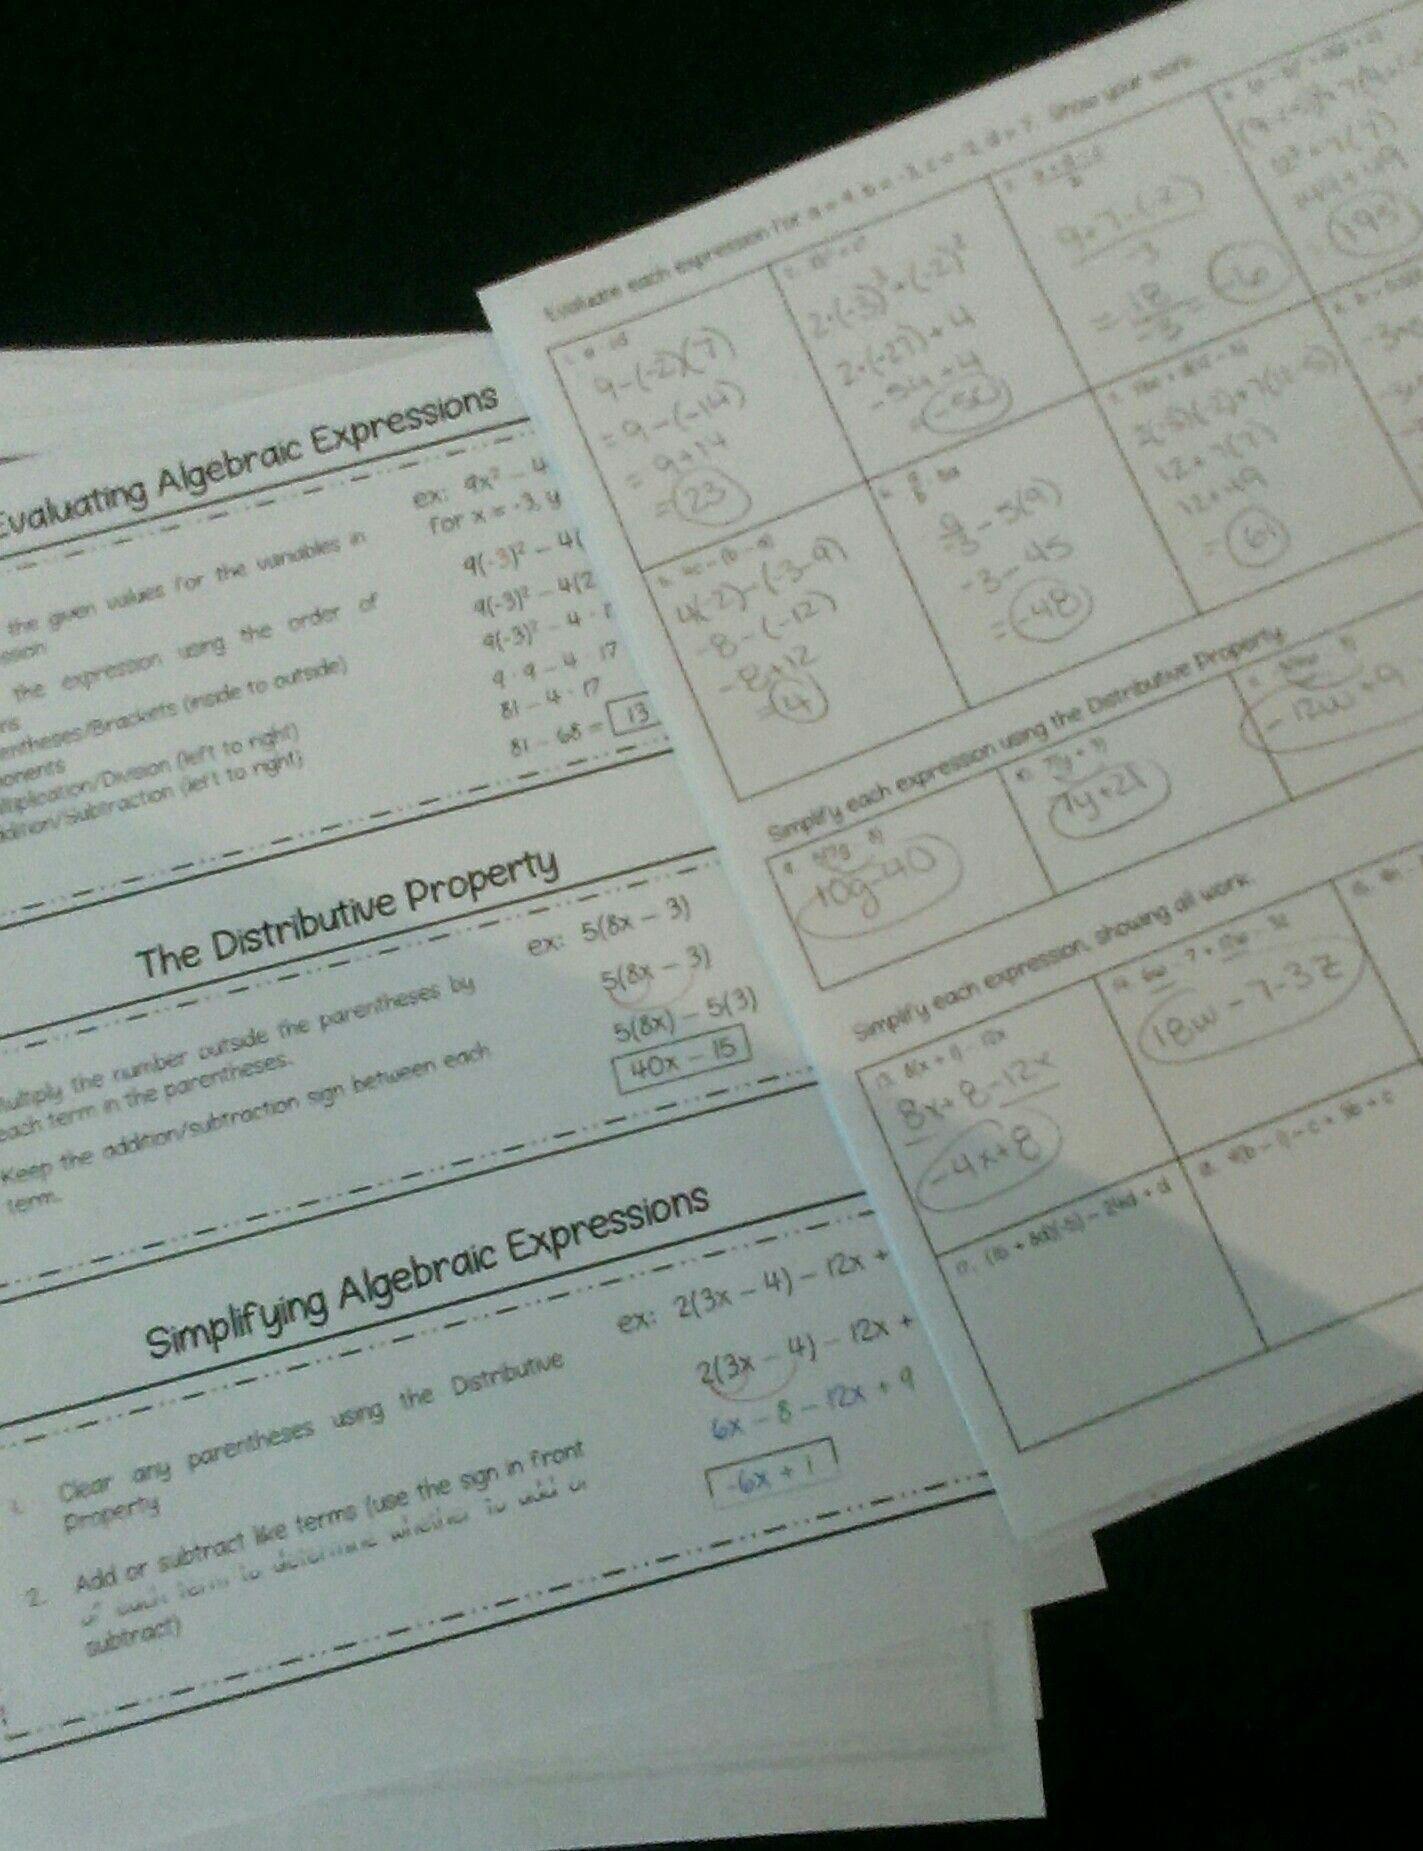 Pre Algebra Review Worksheet Prepare for Algebra I with This Pre Algebra Review Packet